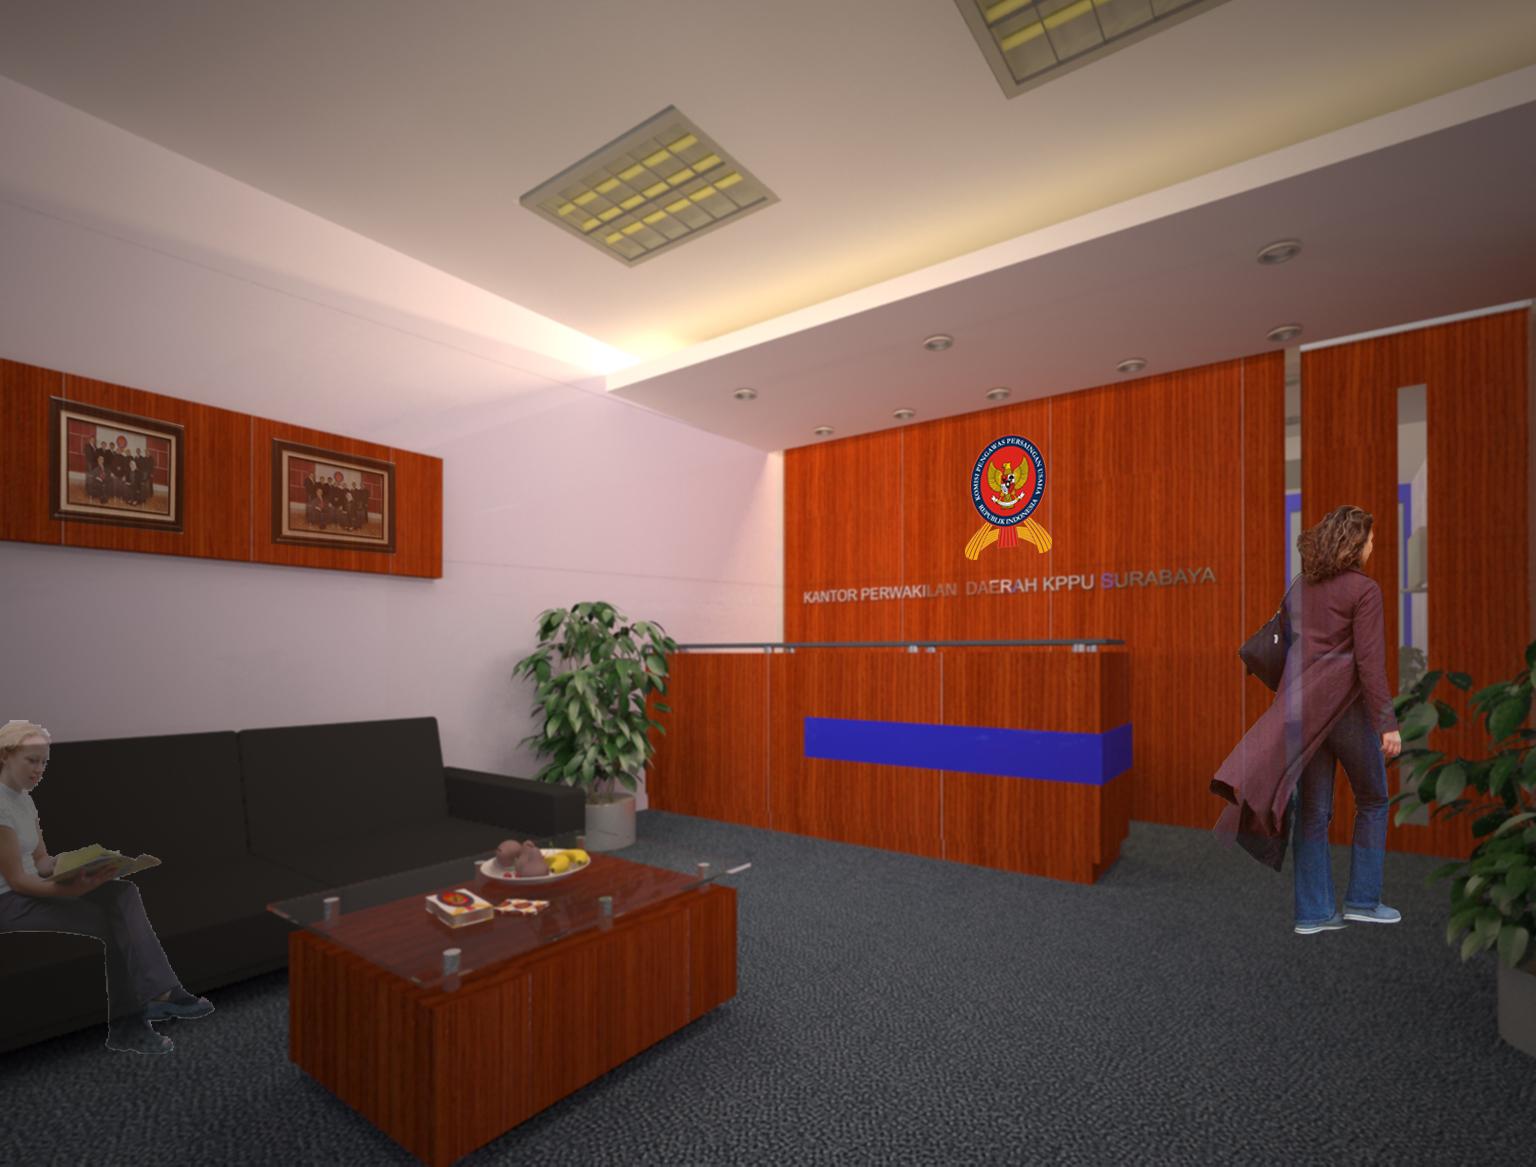 desain interior loby kantor